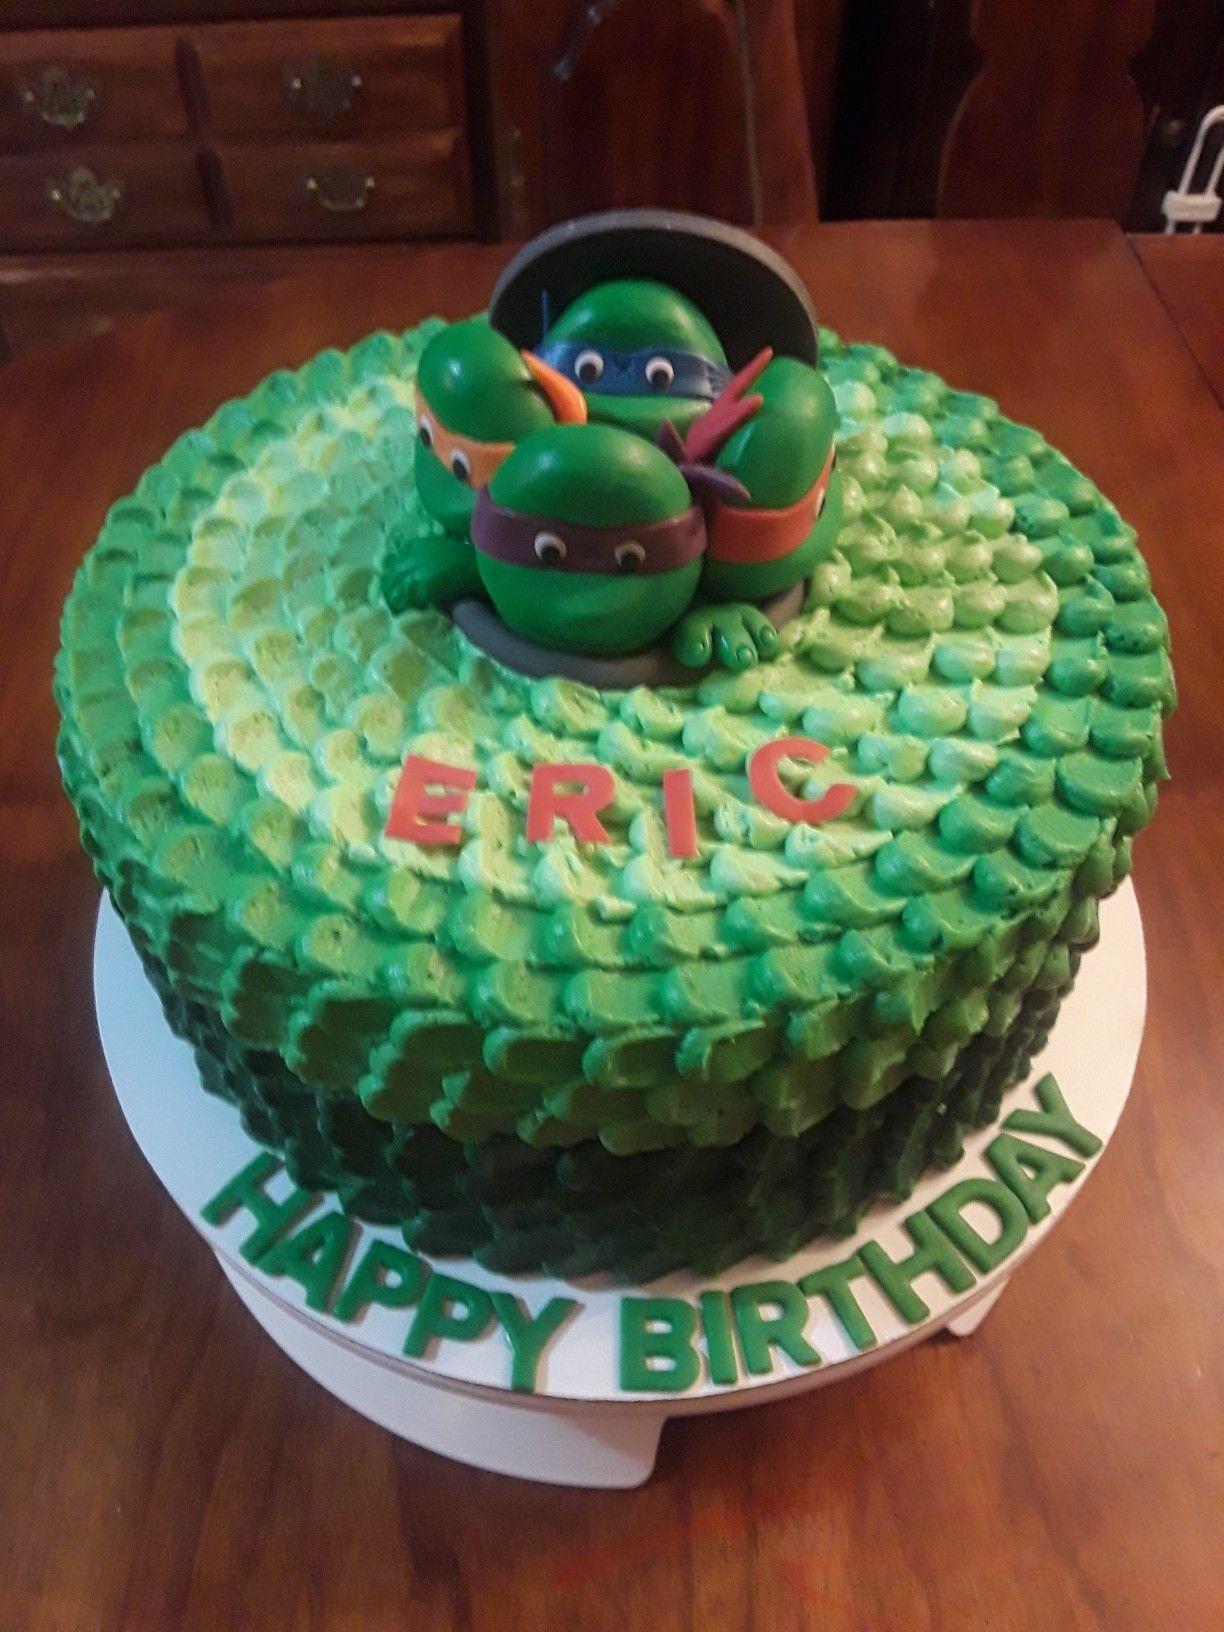 Teenage Mutant Ninja Turtles Ombre Chocolate Cake With Petal Design